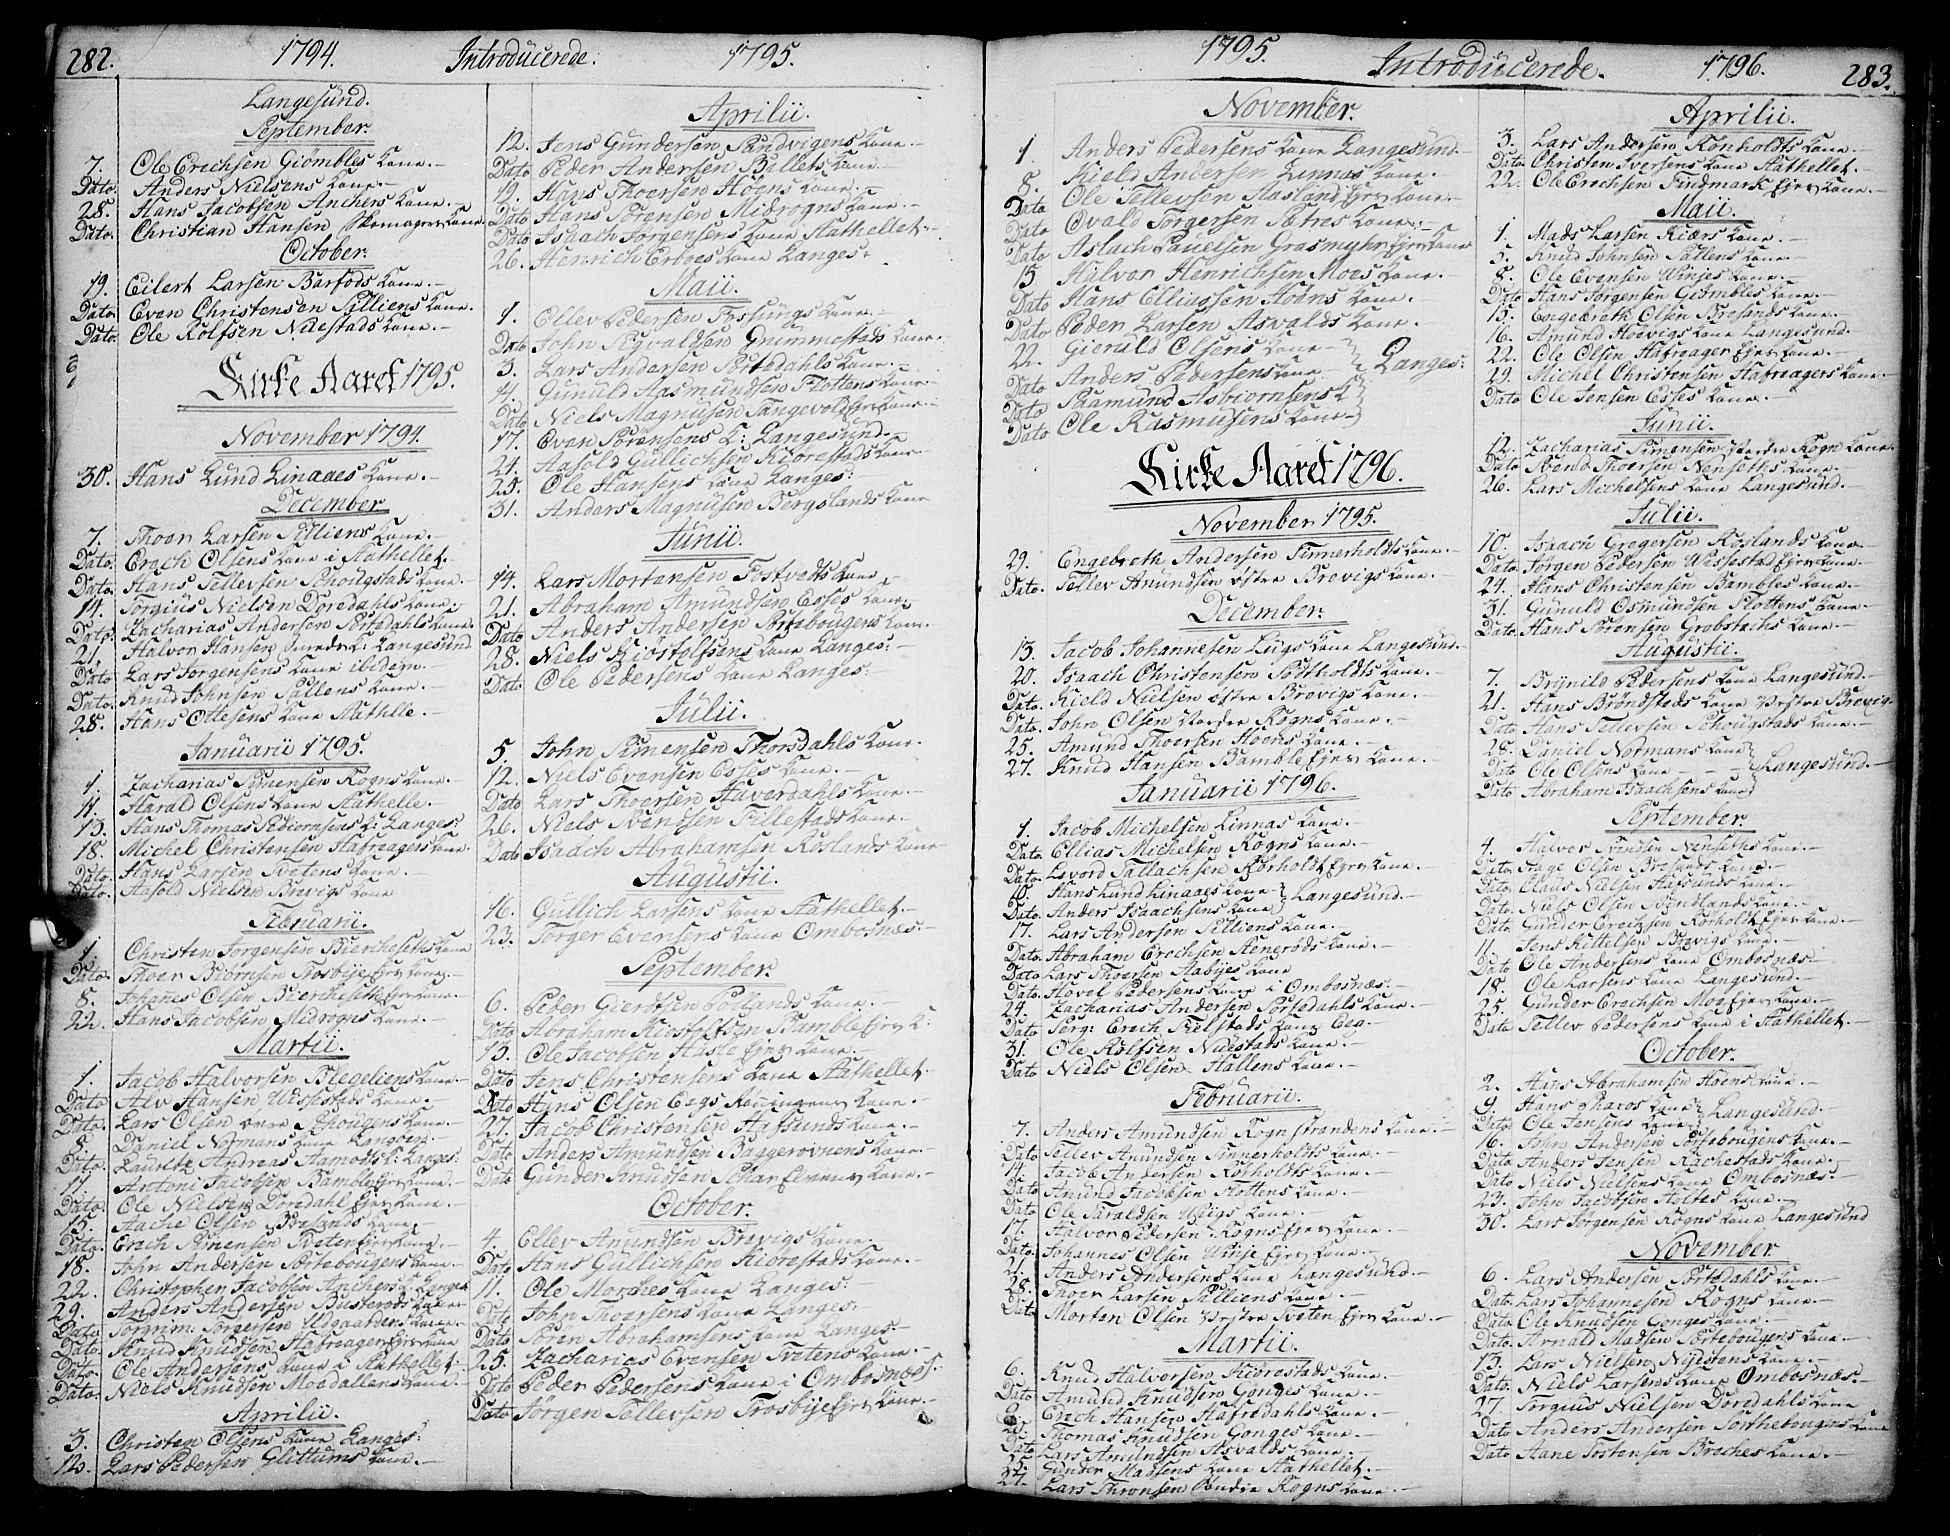 SAKO, Bamble kirkebøker, F/Fa/L0002: Ministerialbok nr. I 2, 1775-1814, s. 282-283